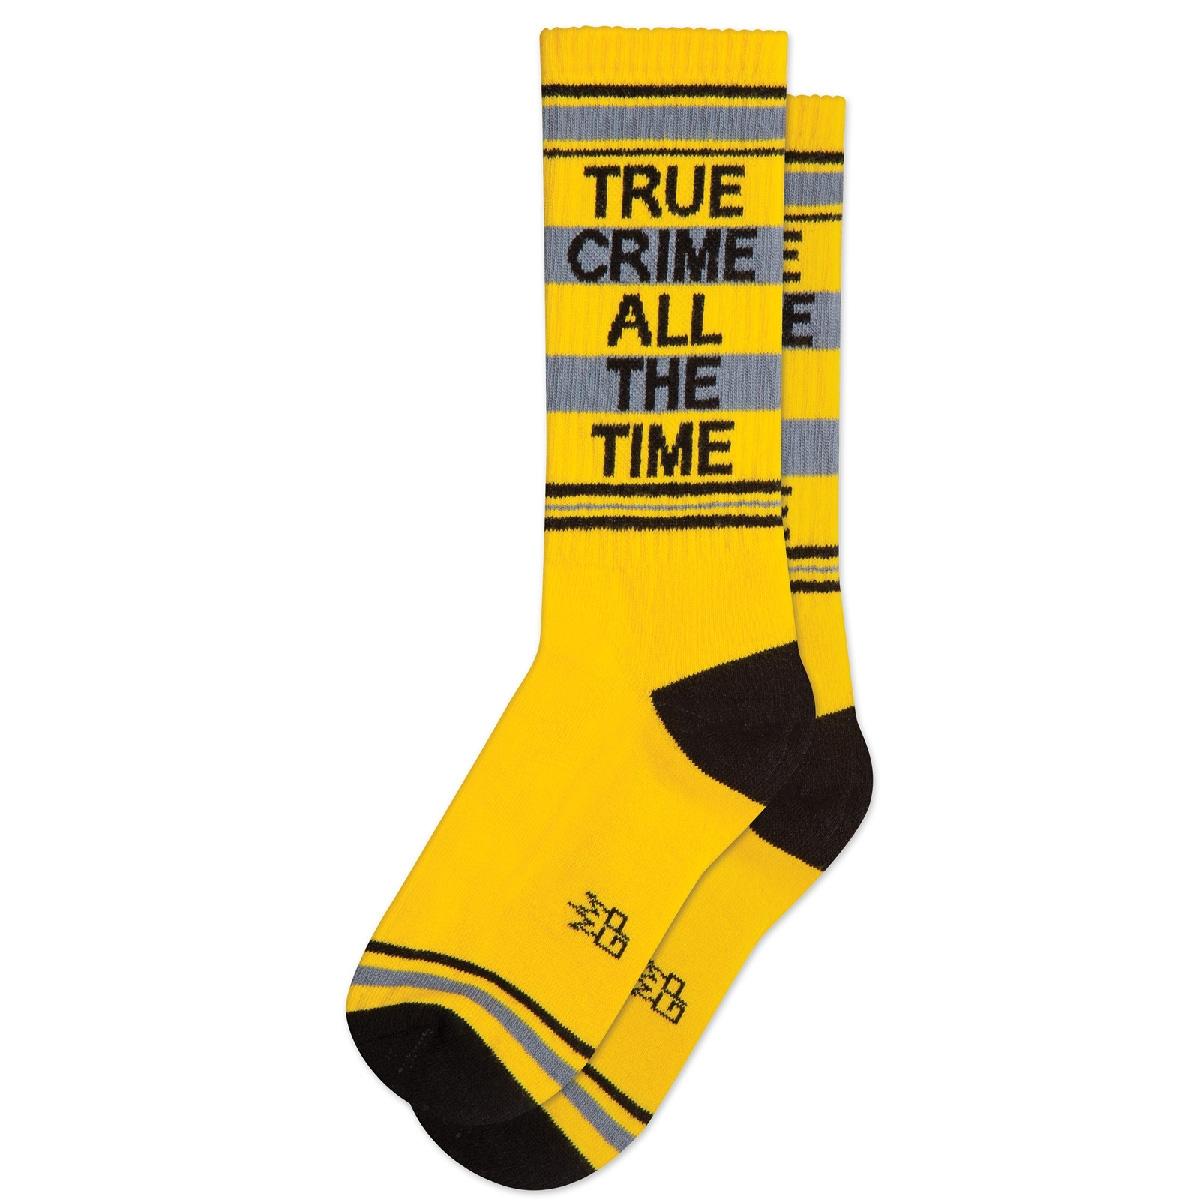 True Crime All The Time Socks